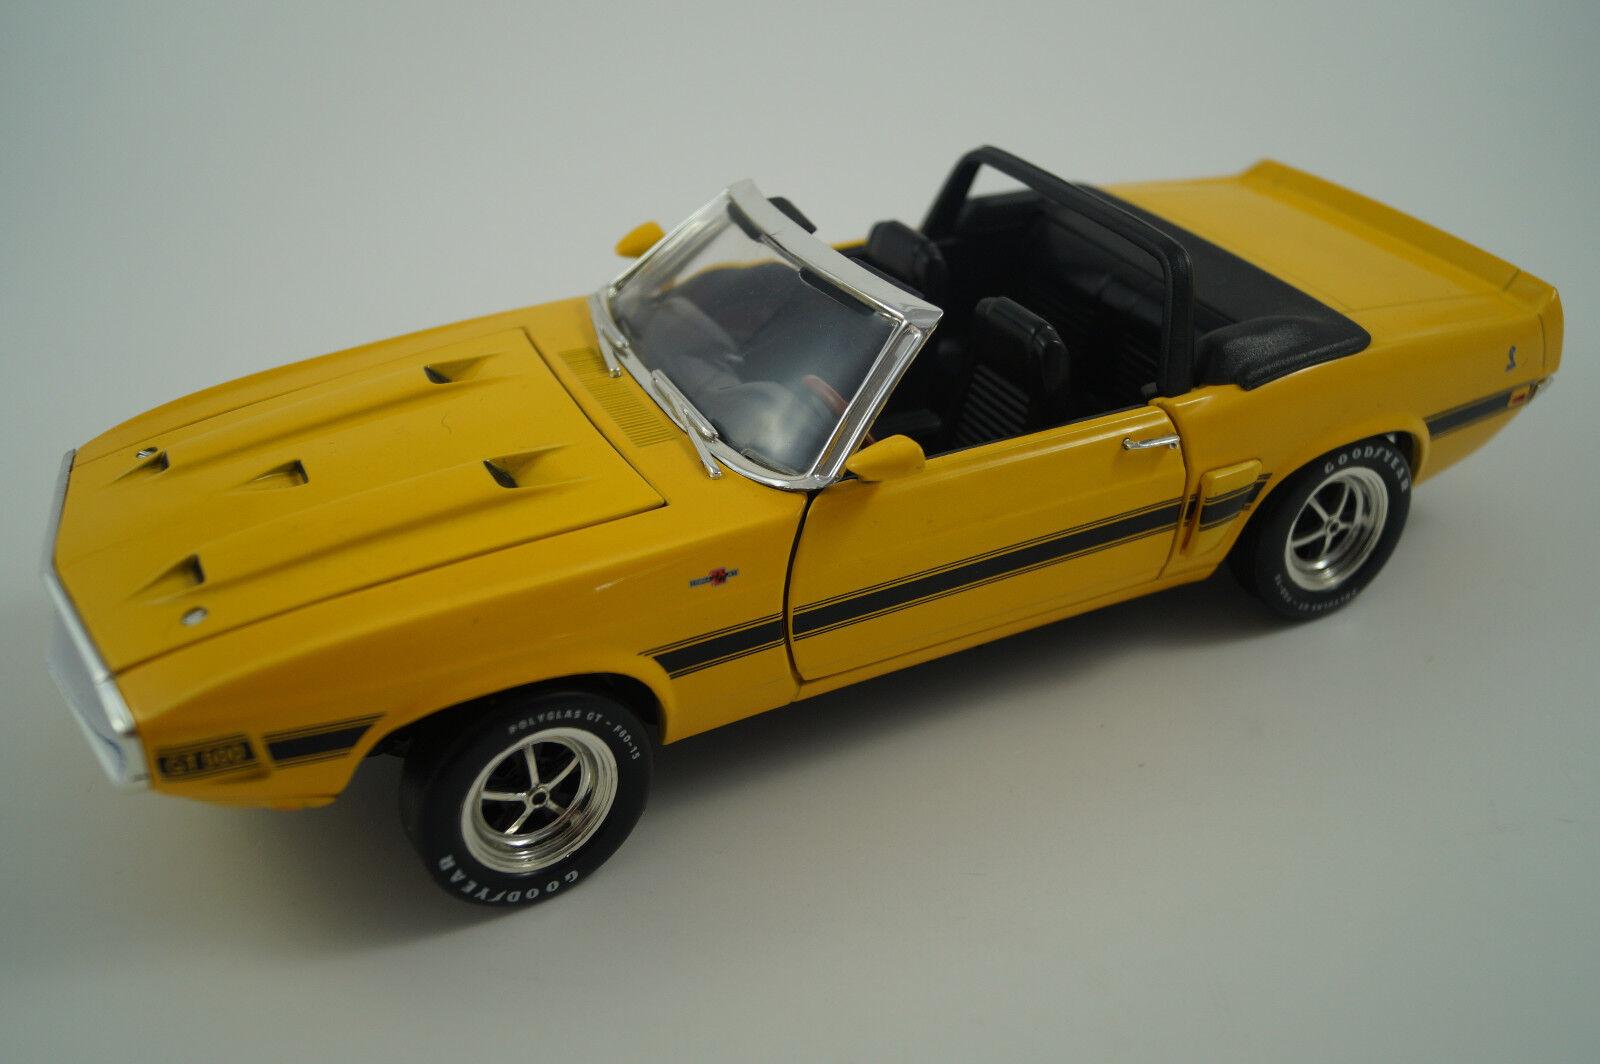 ERTL voiture miniature 1 18 Shelby gt-500 1969 Cabrio